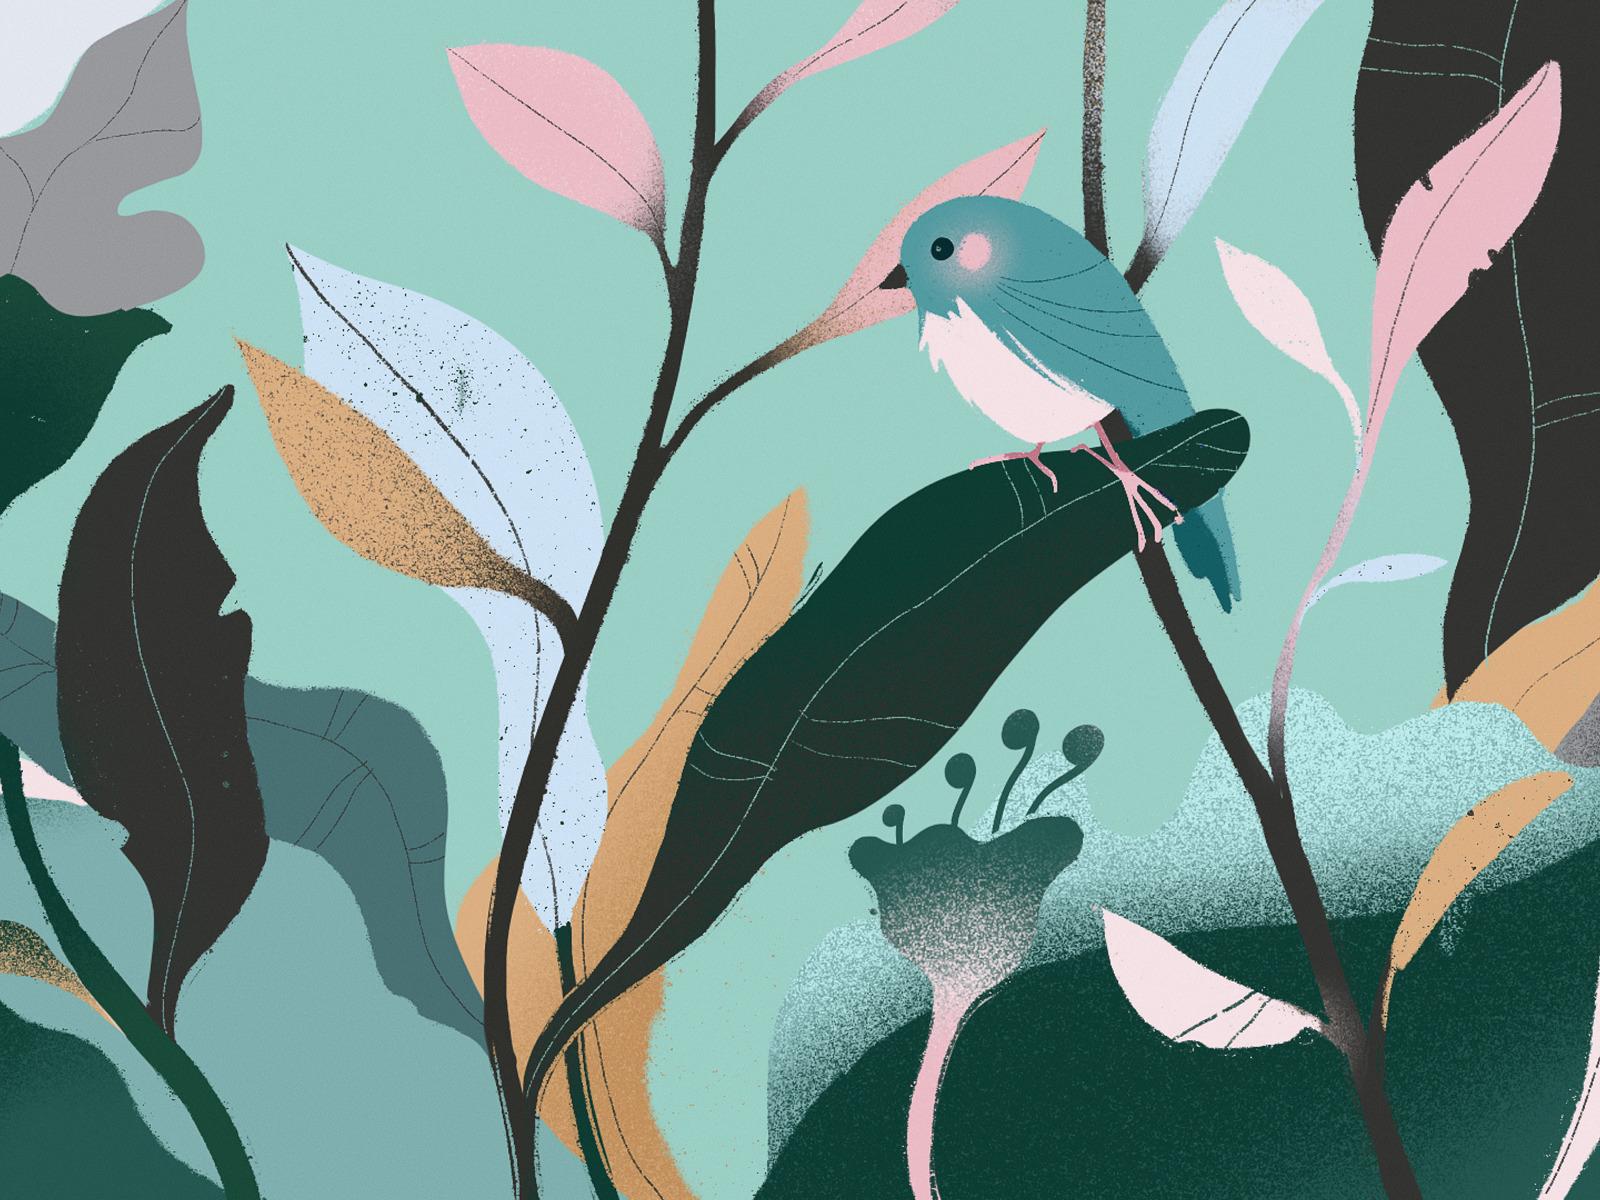 nature harmony illustration